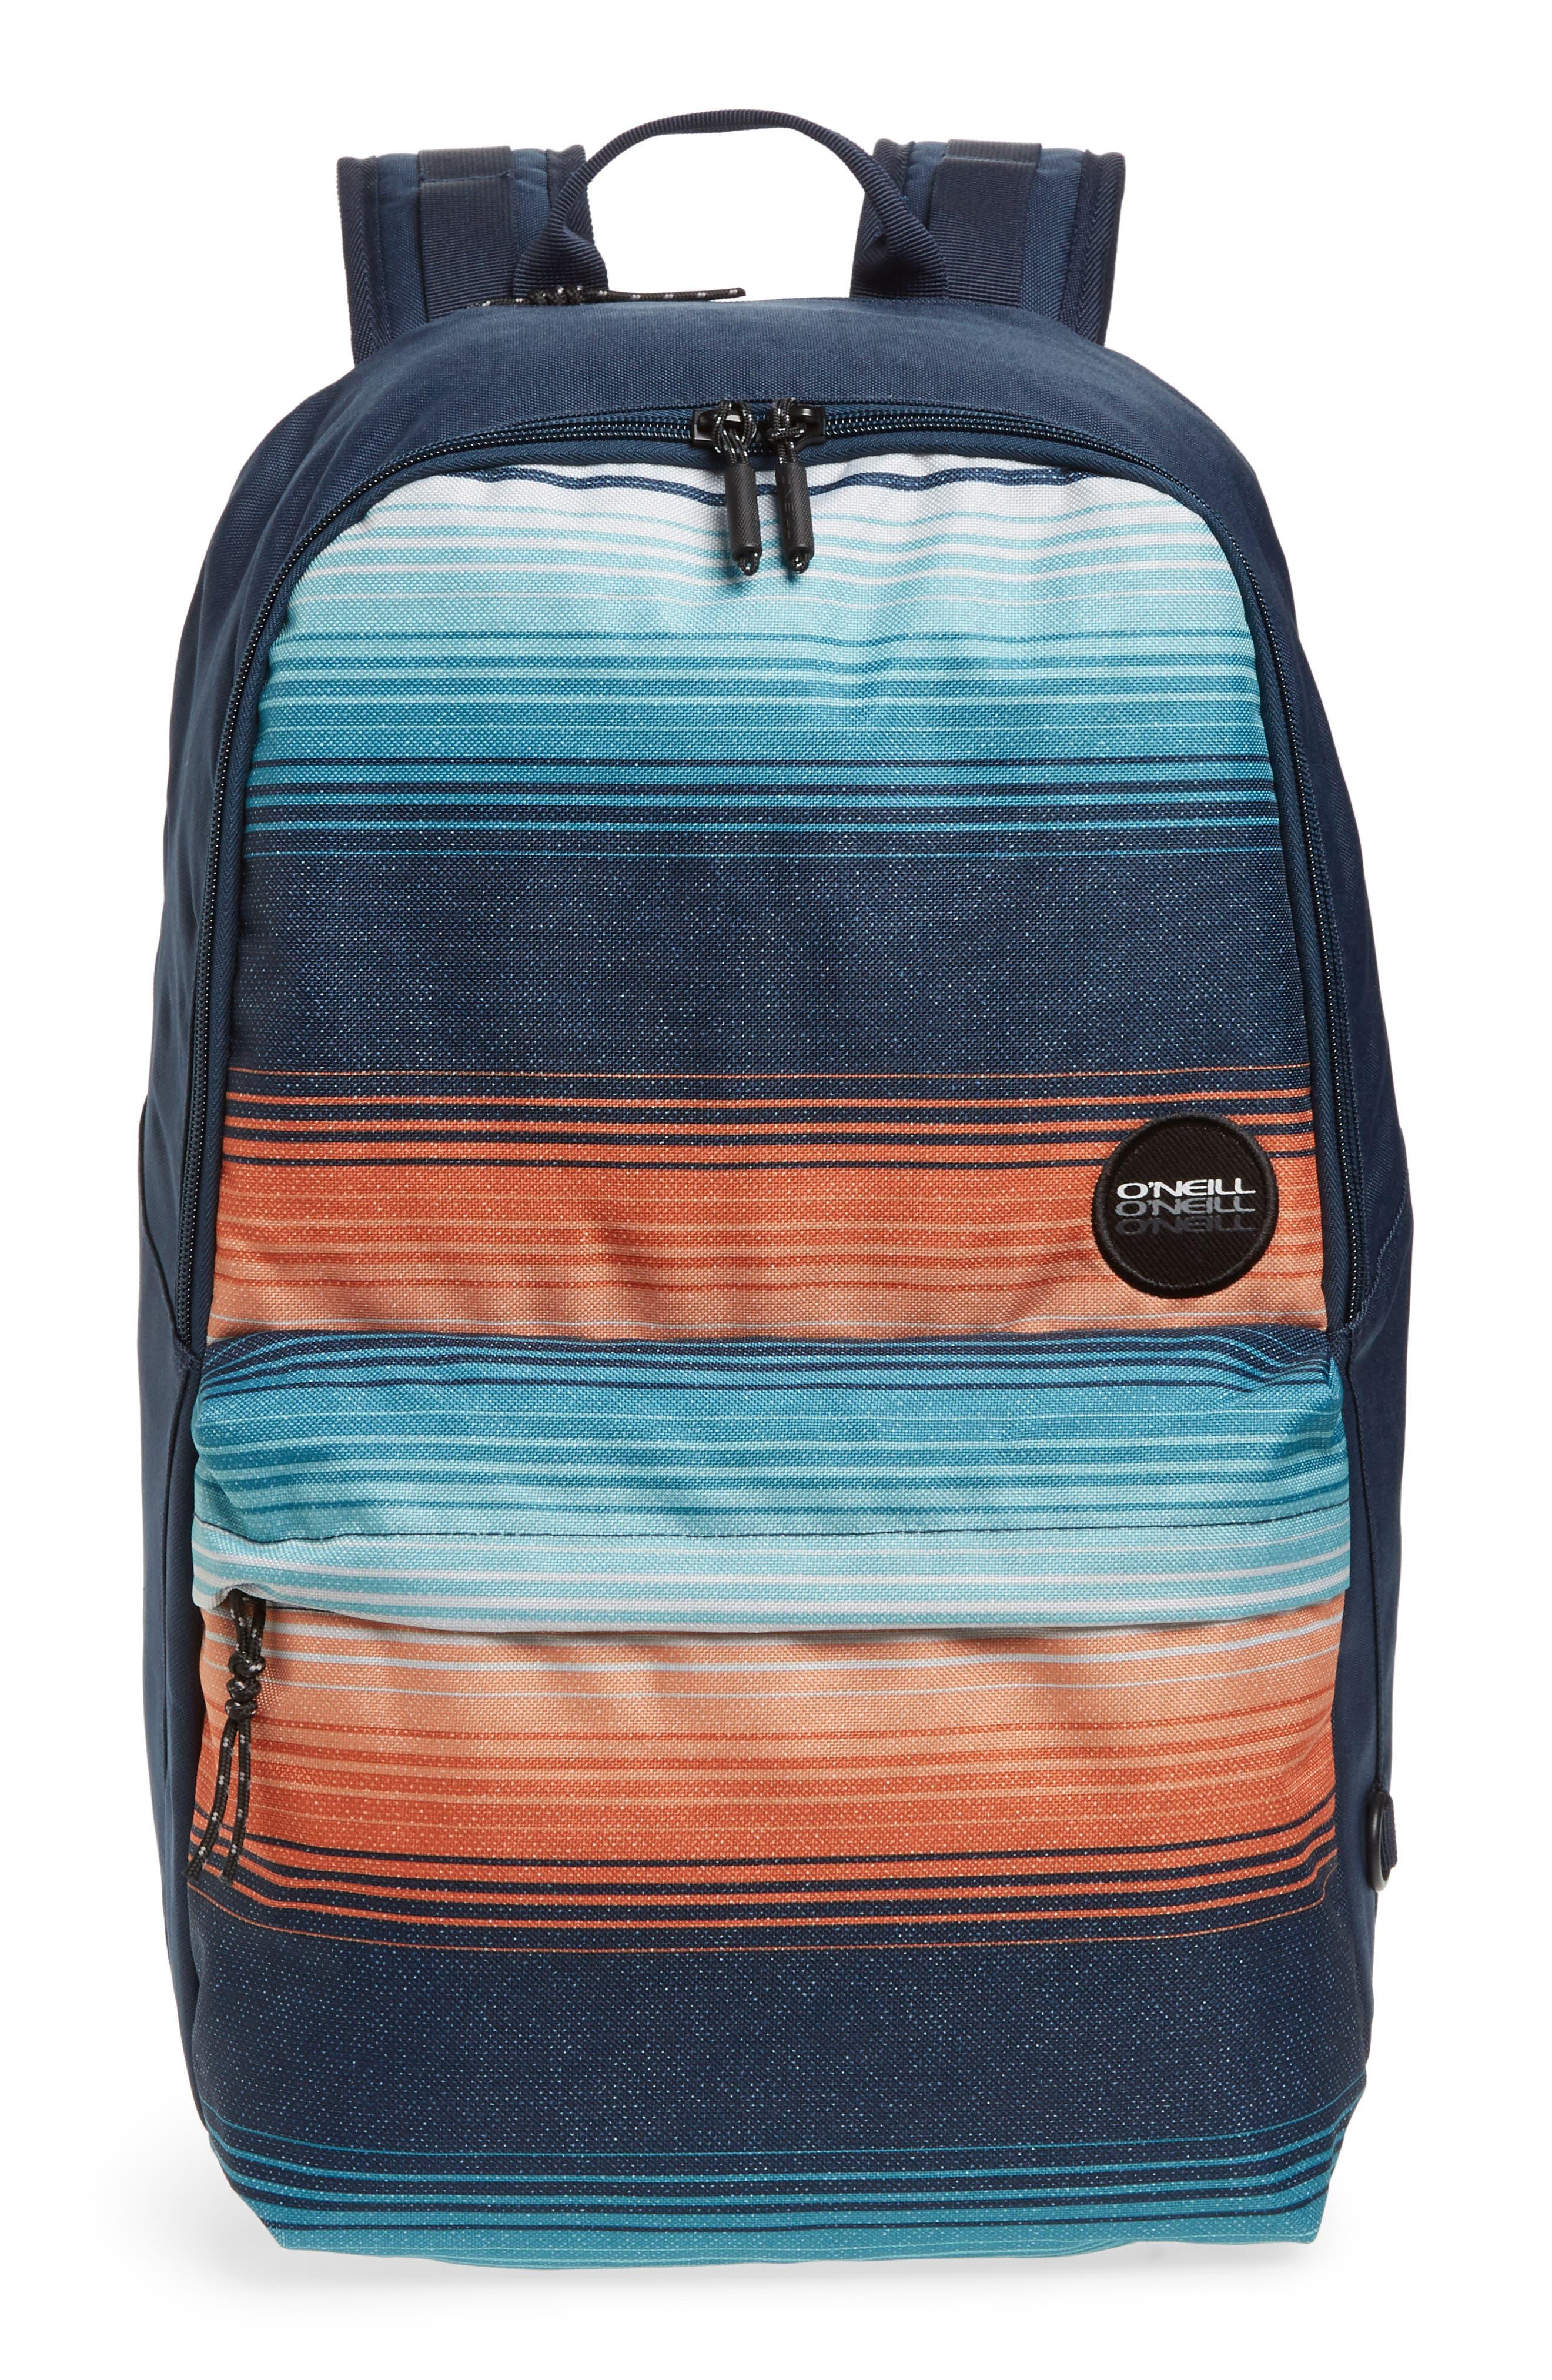 Transfer Backpack,                             Main thumbnail 1, color,                             NAVY